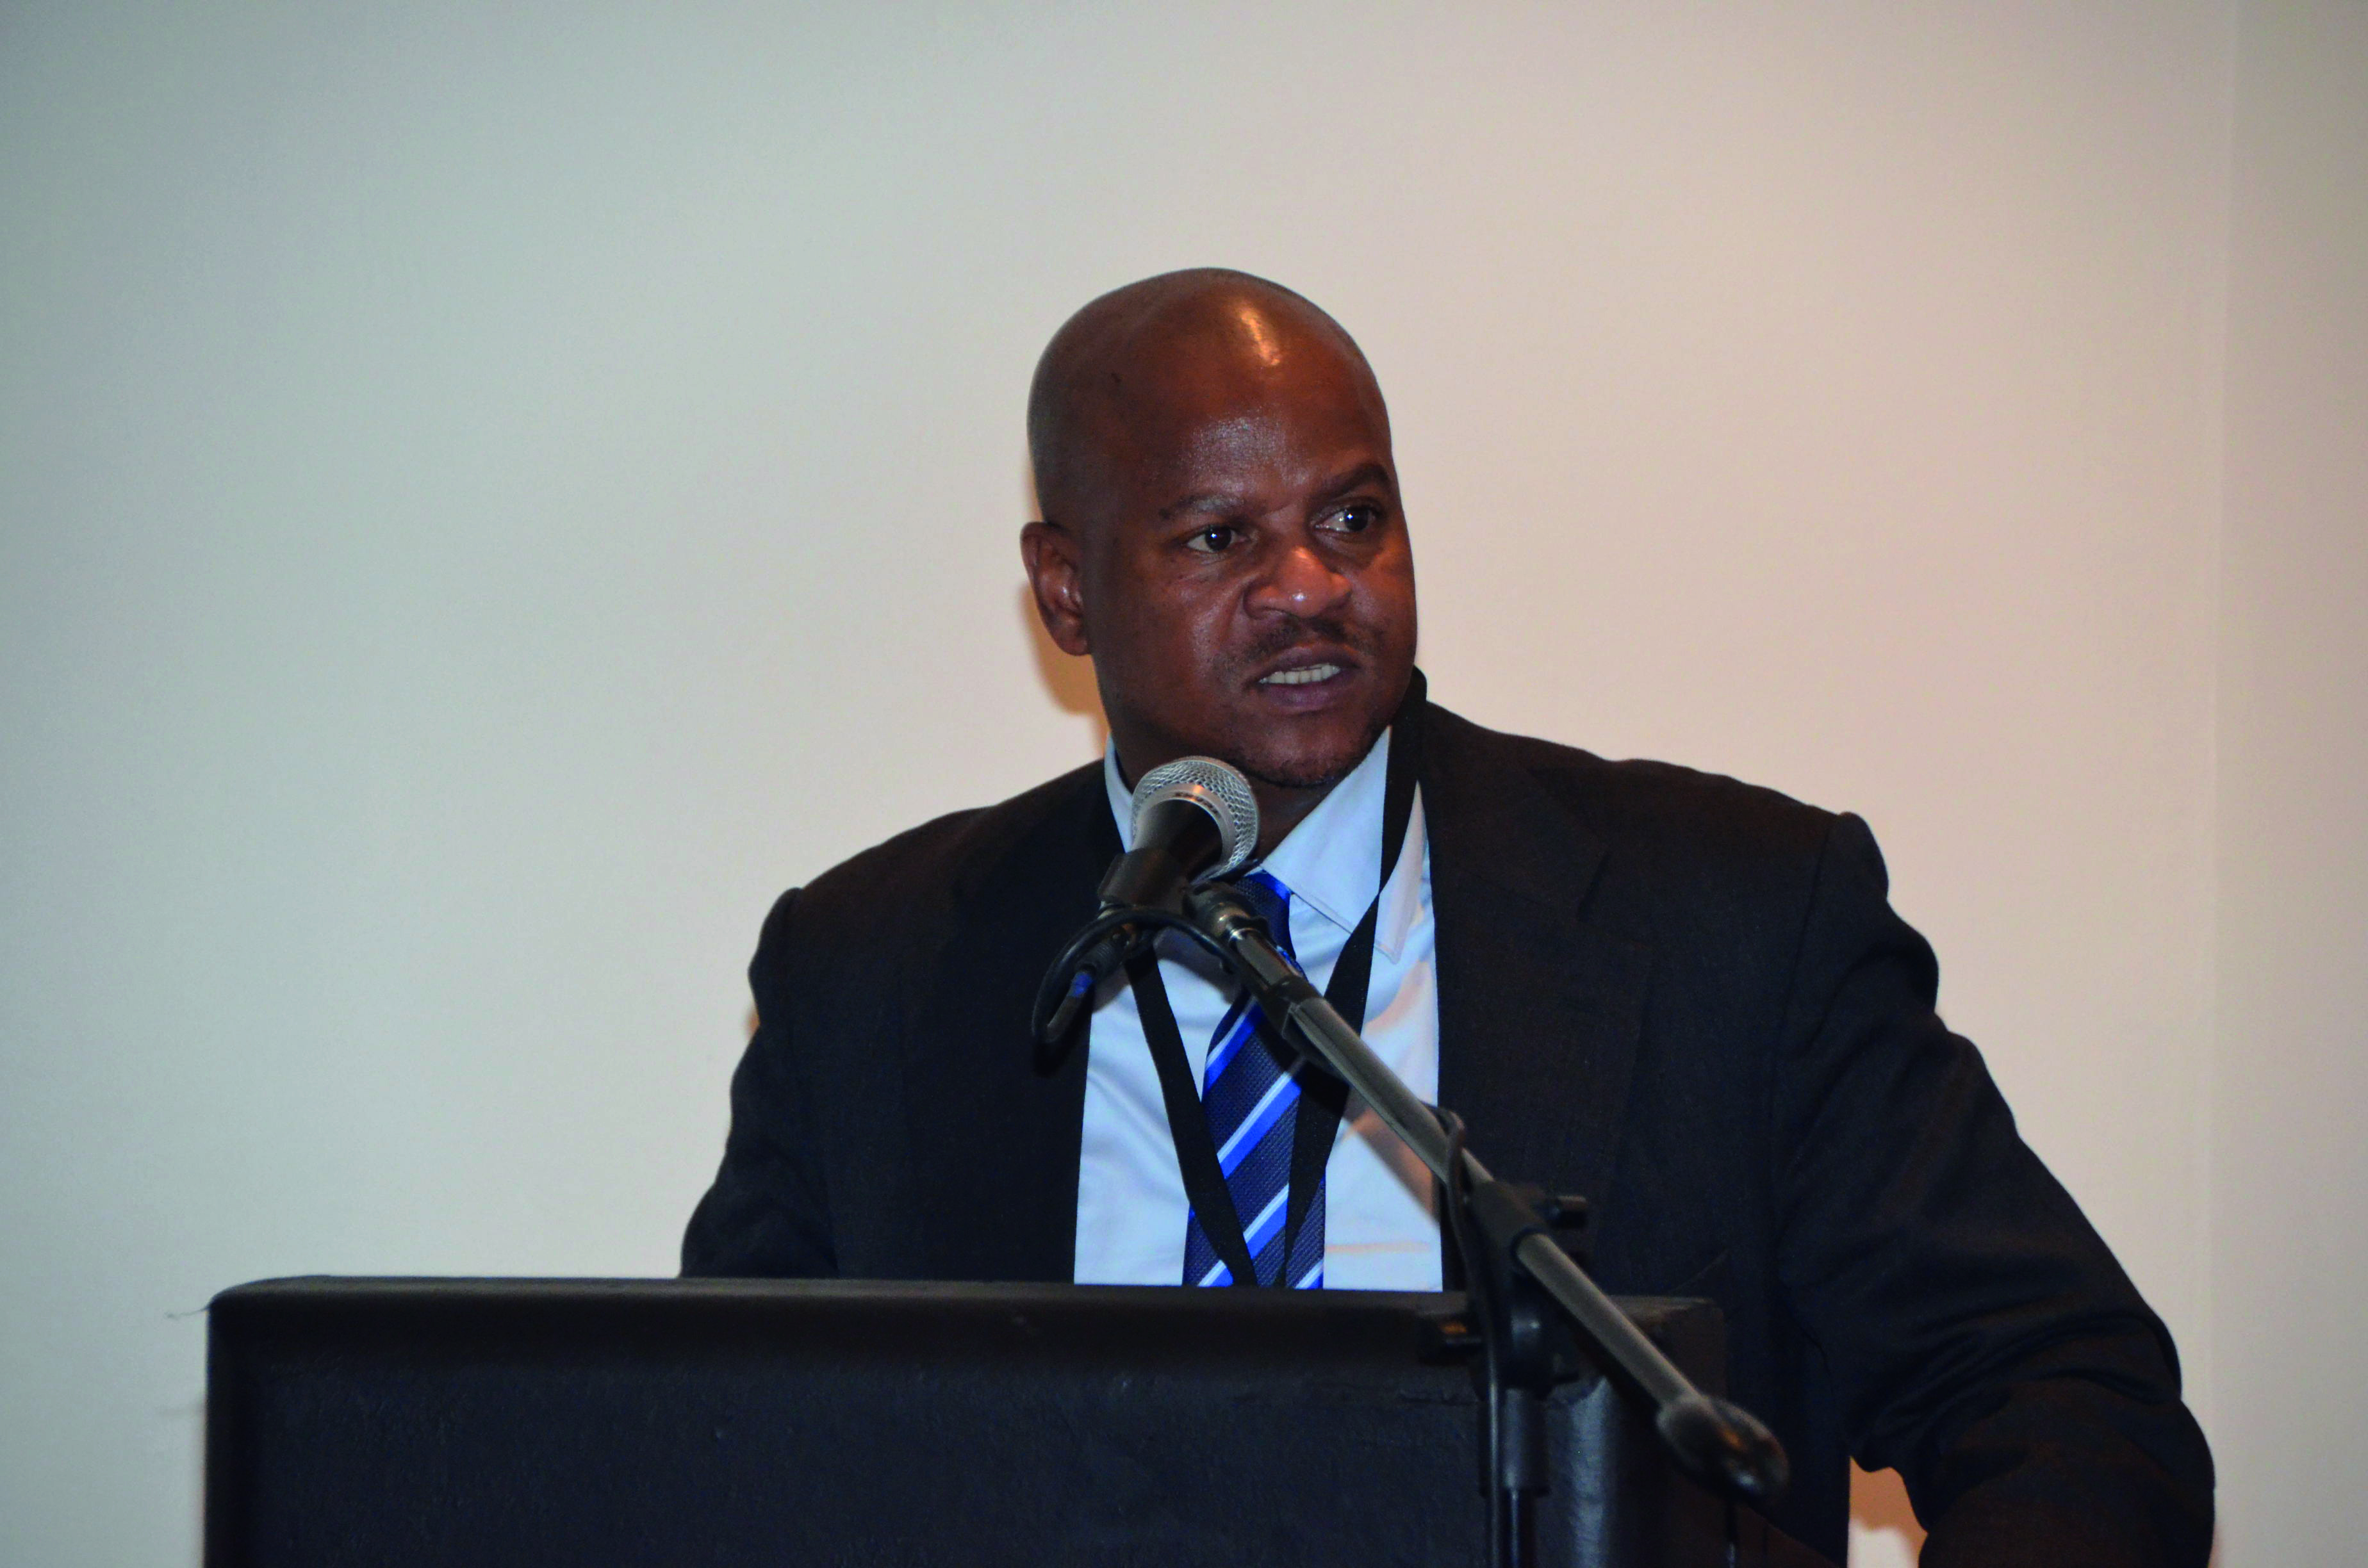 Image: SALGA's Executive Director of Municipal Finance Simphiwe Dzengwa